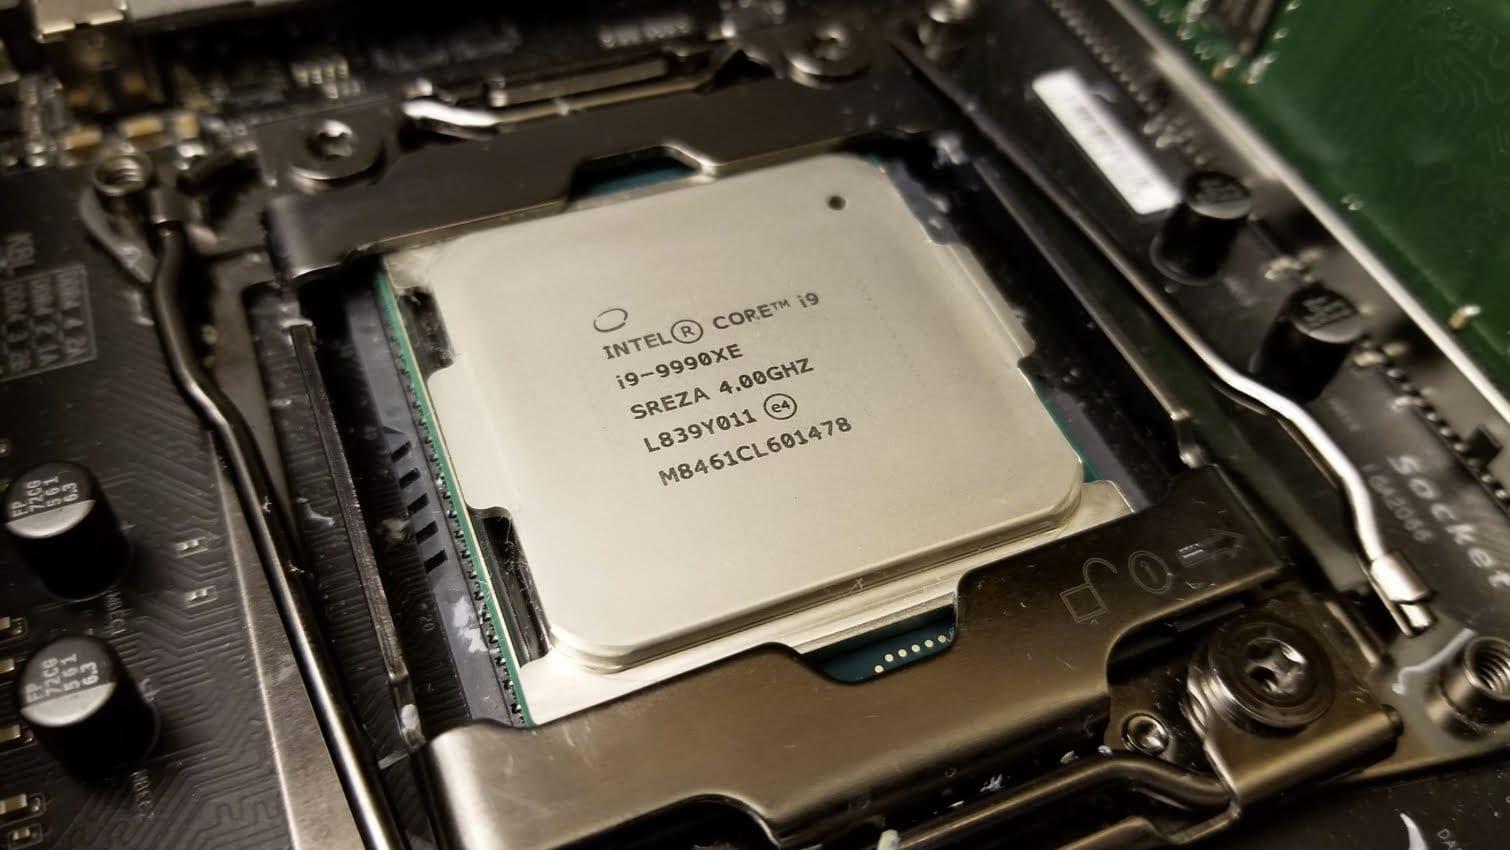 Splave обновил рекорд в  Geekbench3 для 18 ядерных CPU и Core i9 9980XE